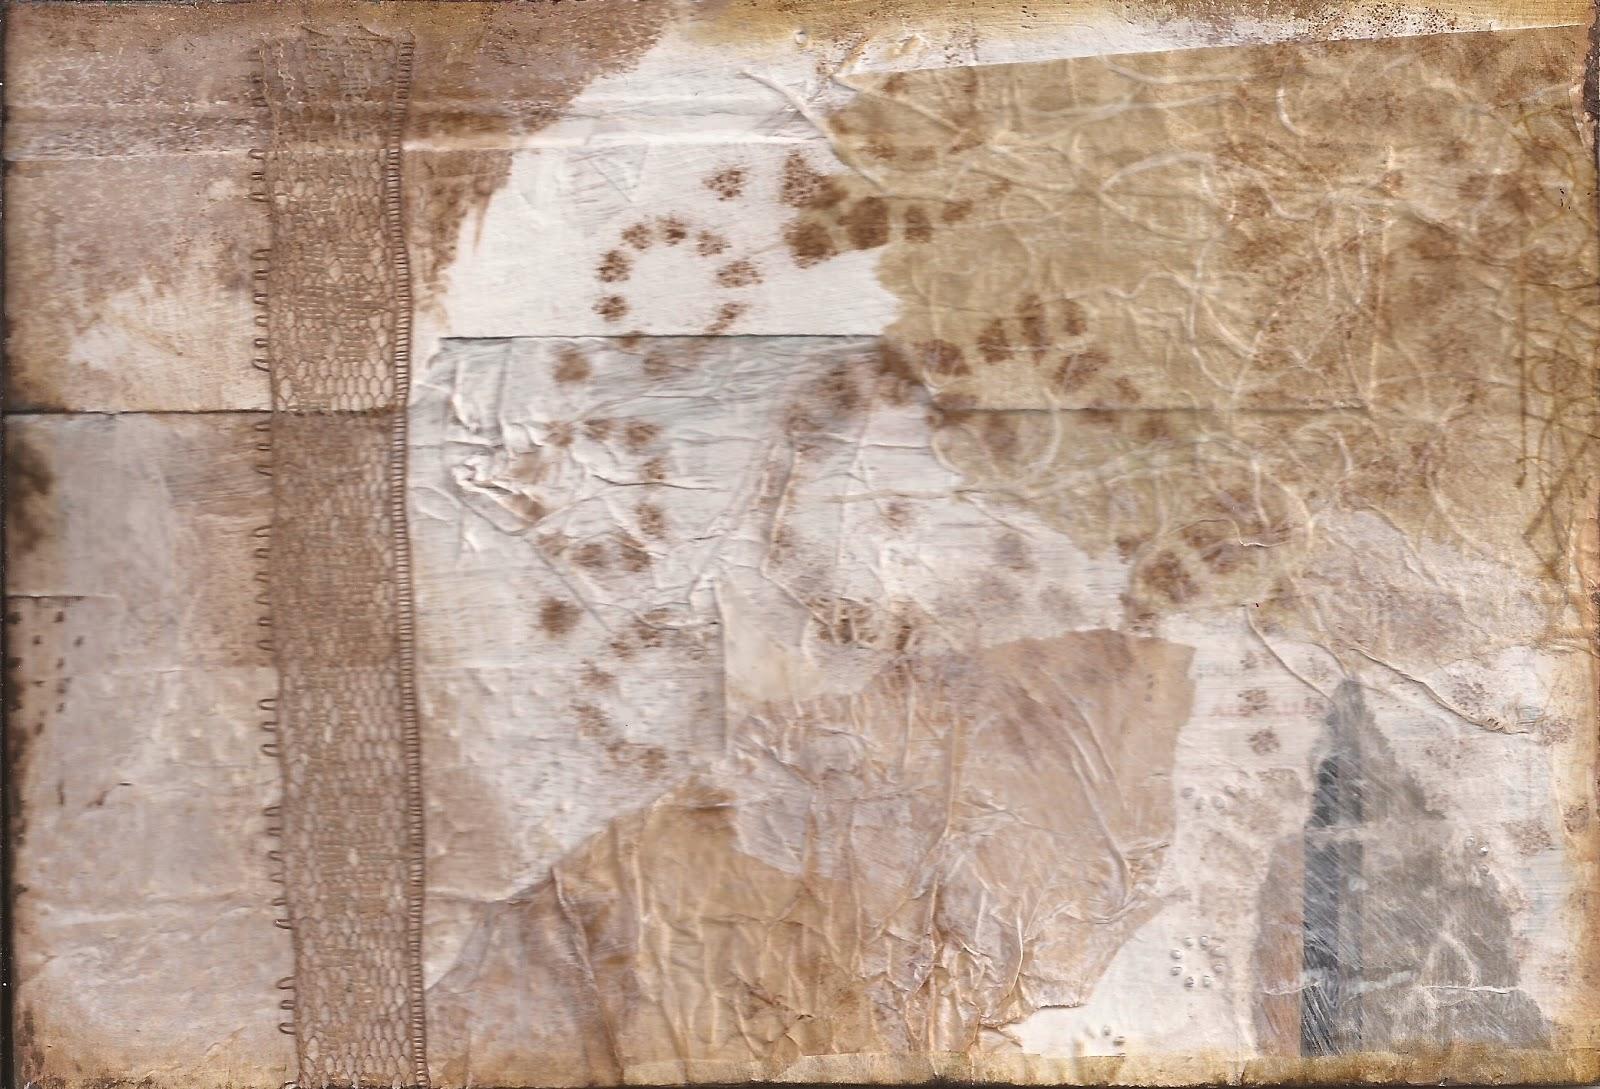 I am Rushmore: October 2012